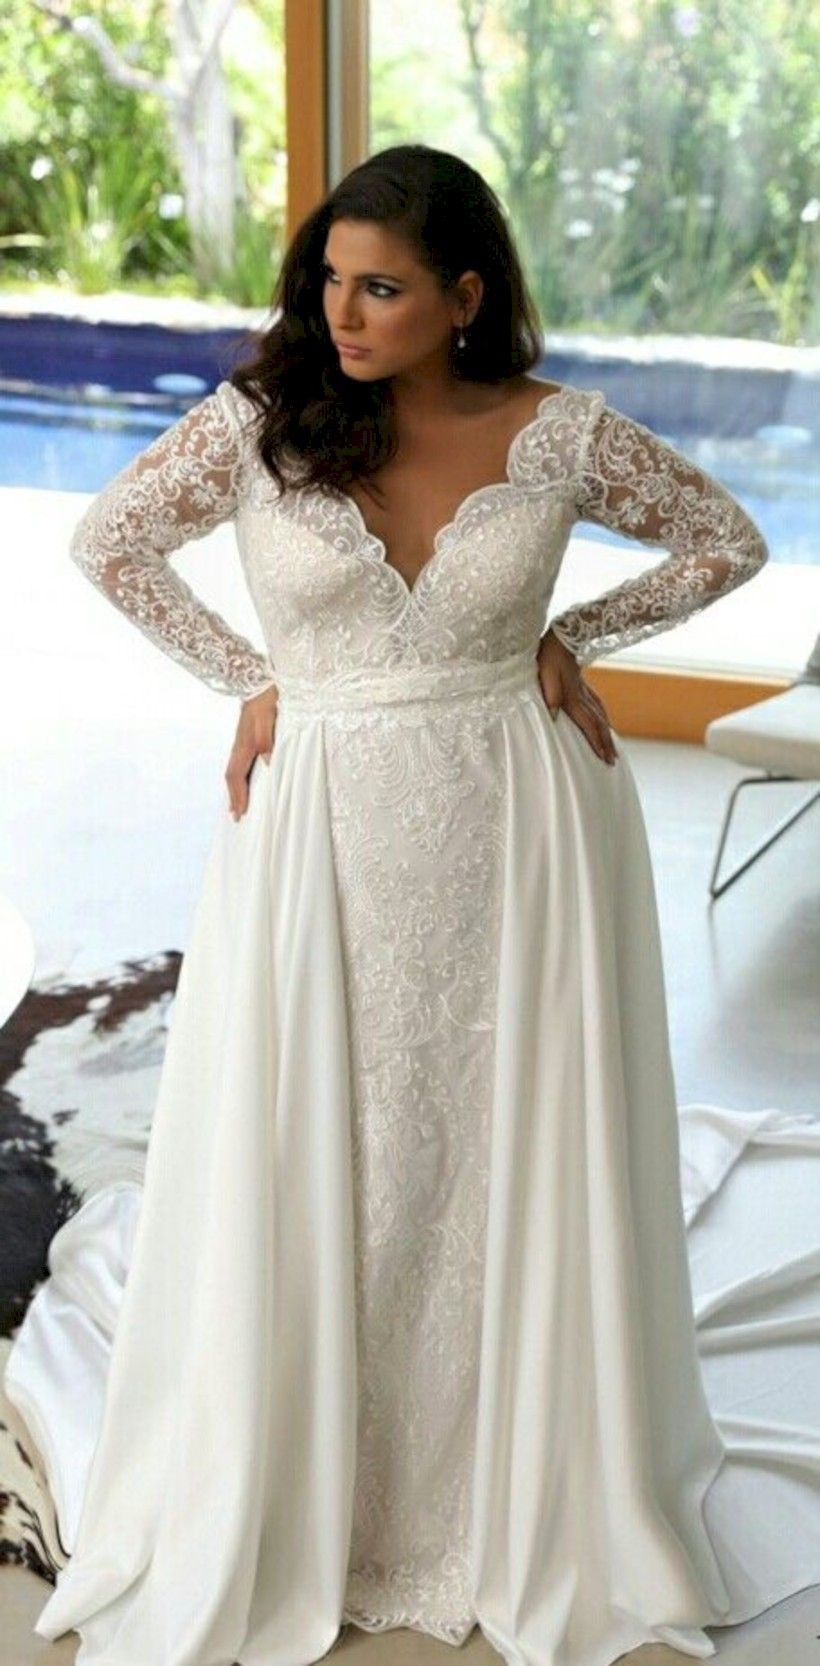 44 Beautiful Plus Size Winter Wedding Dress Ideas | Plus ...